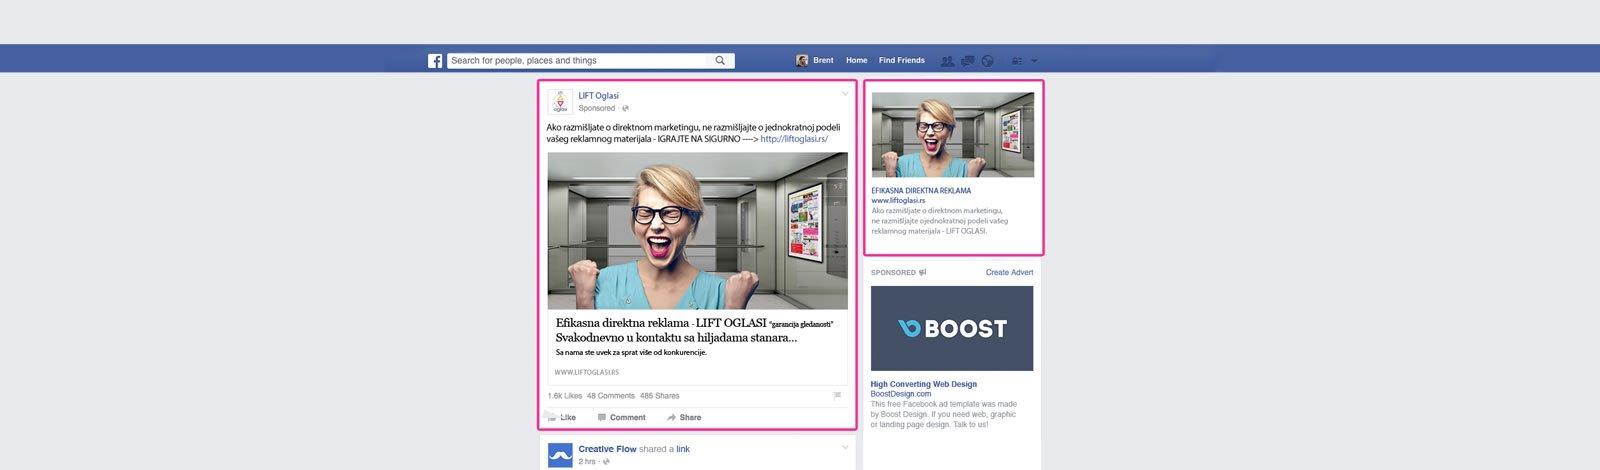 slider-facebook-reklamiranje